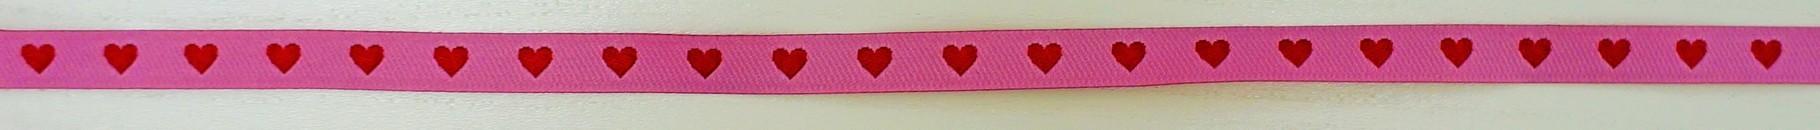 Herzen auf rosa